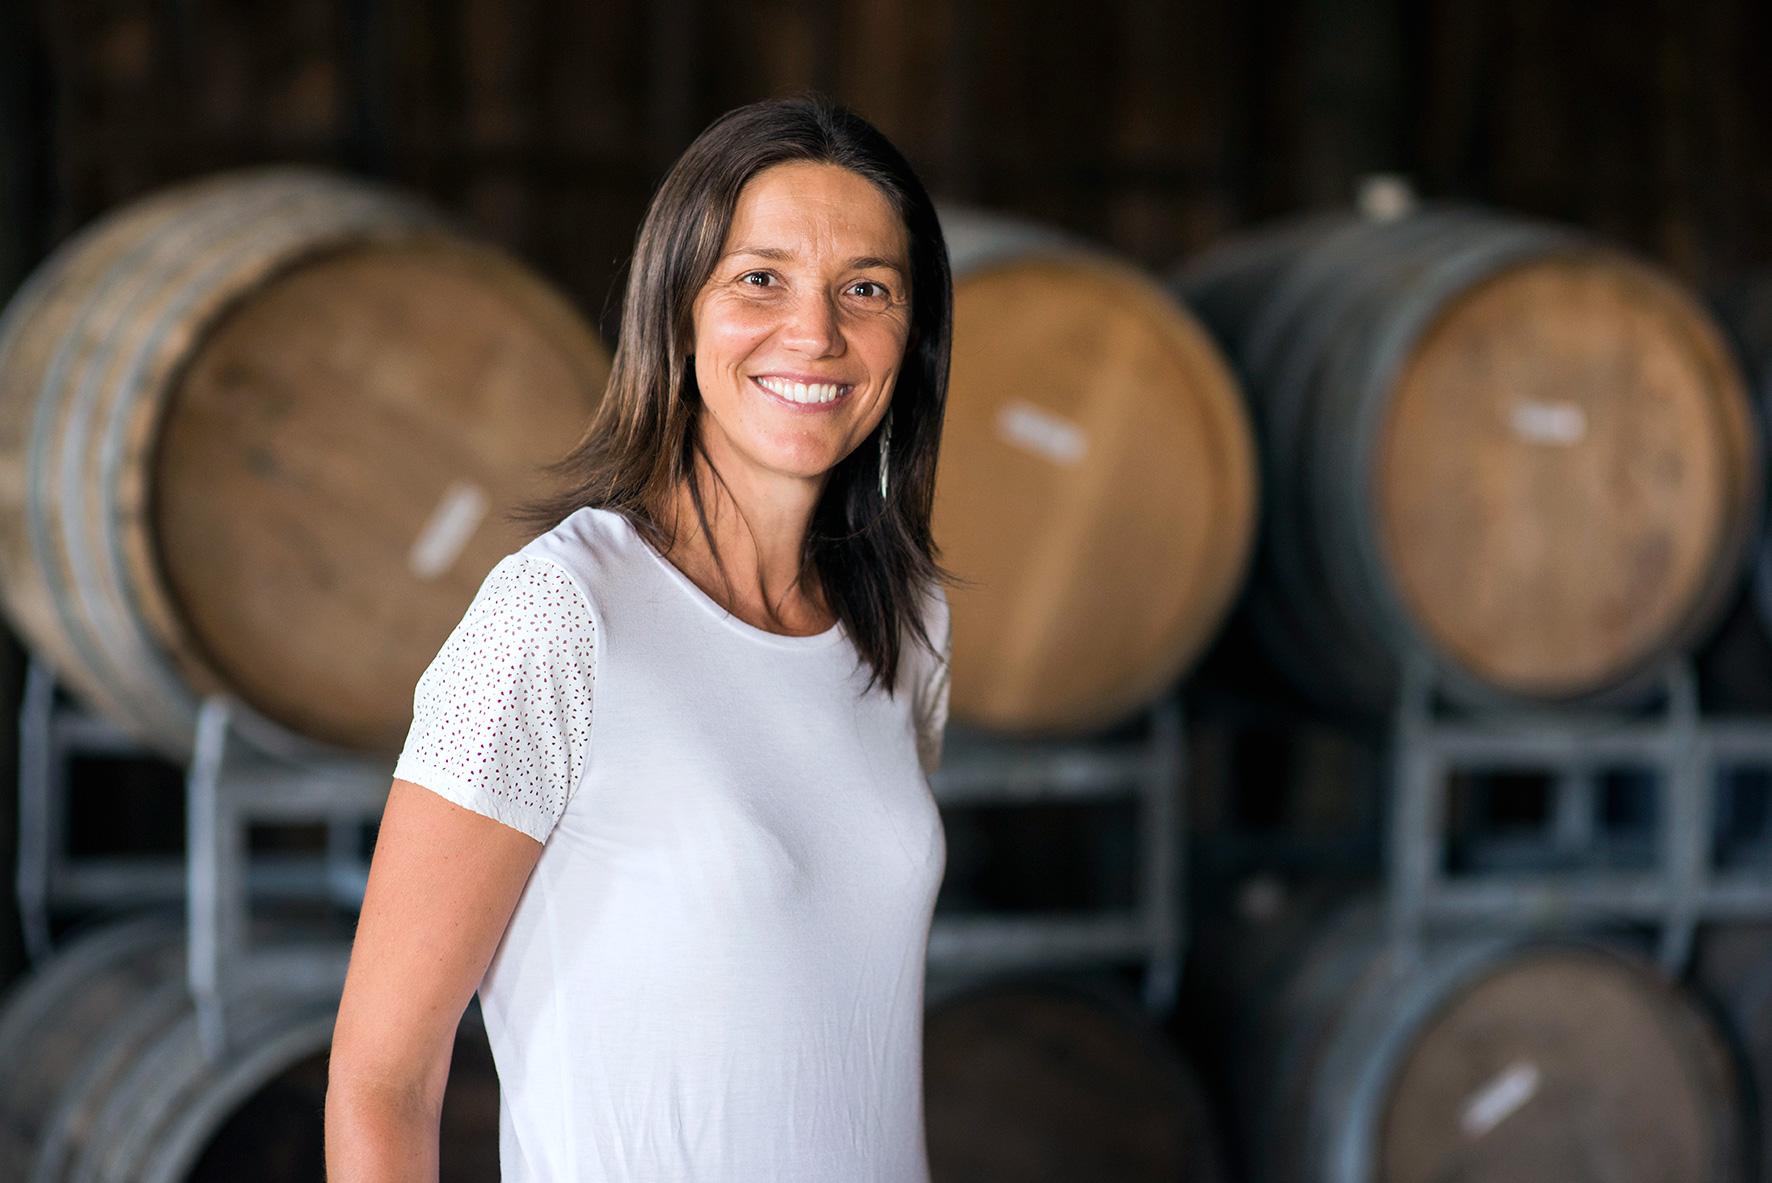 Kirsten Searle, owner of Matawhero Wines posing in front of wine barrels